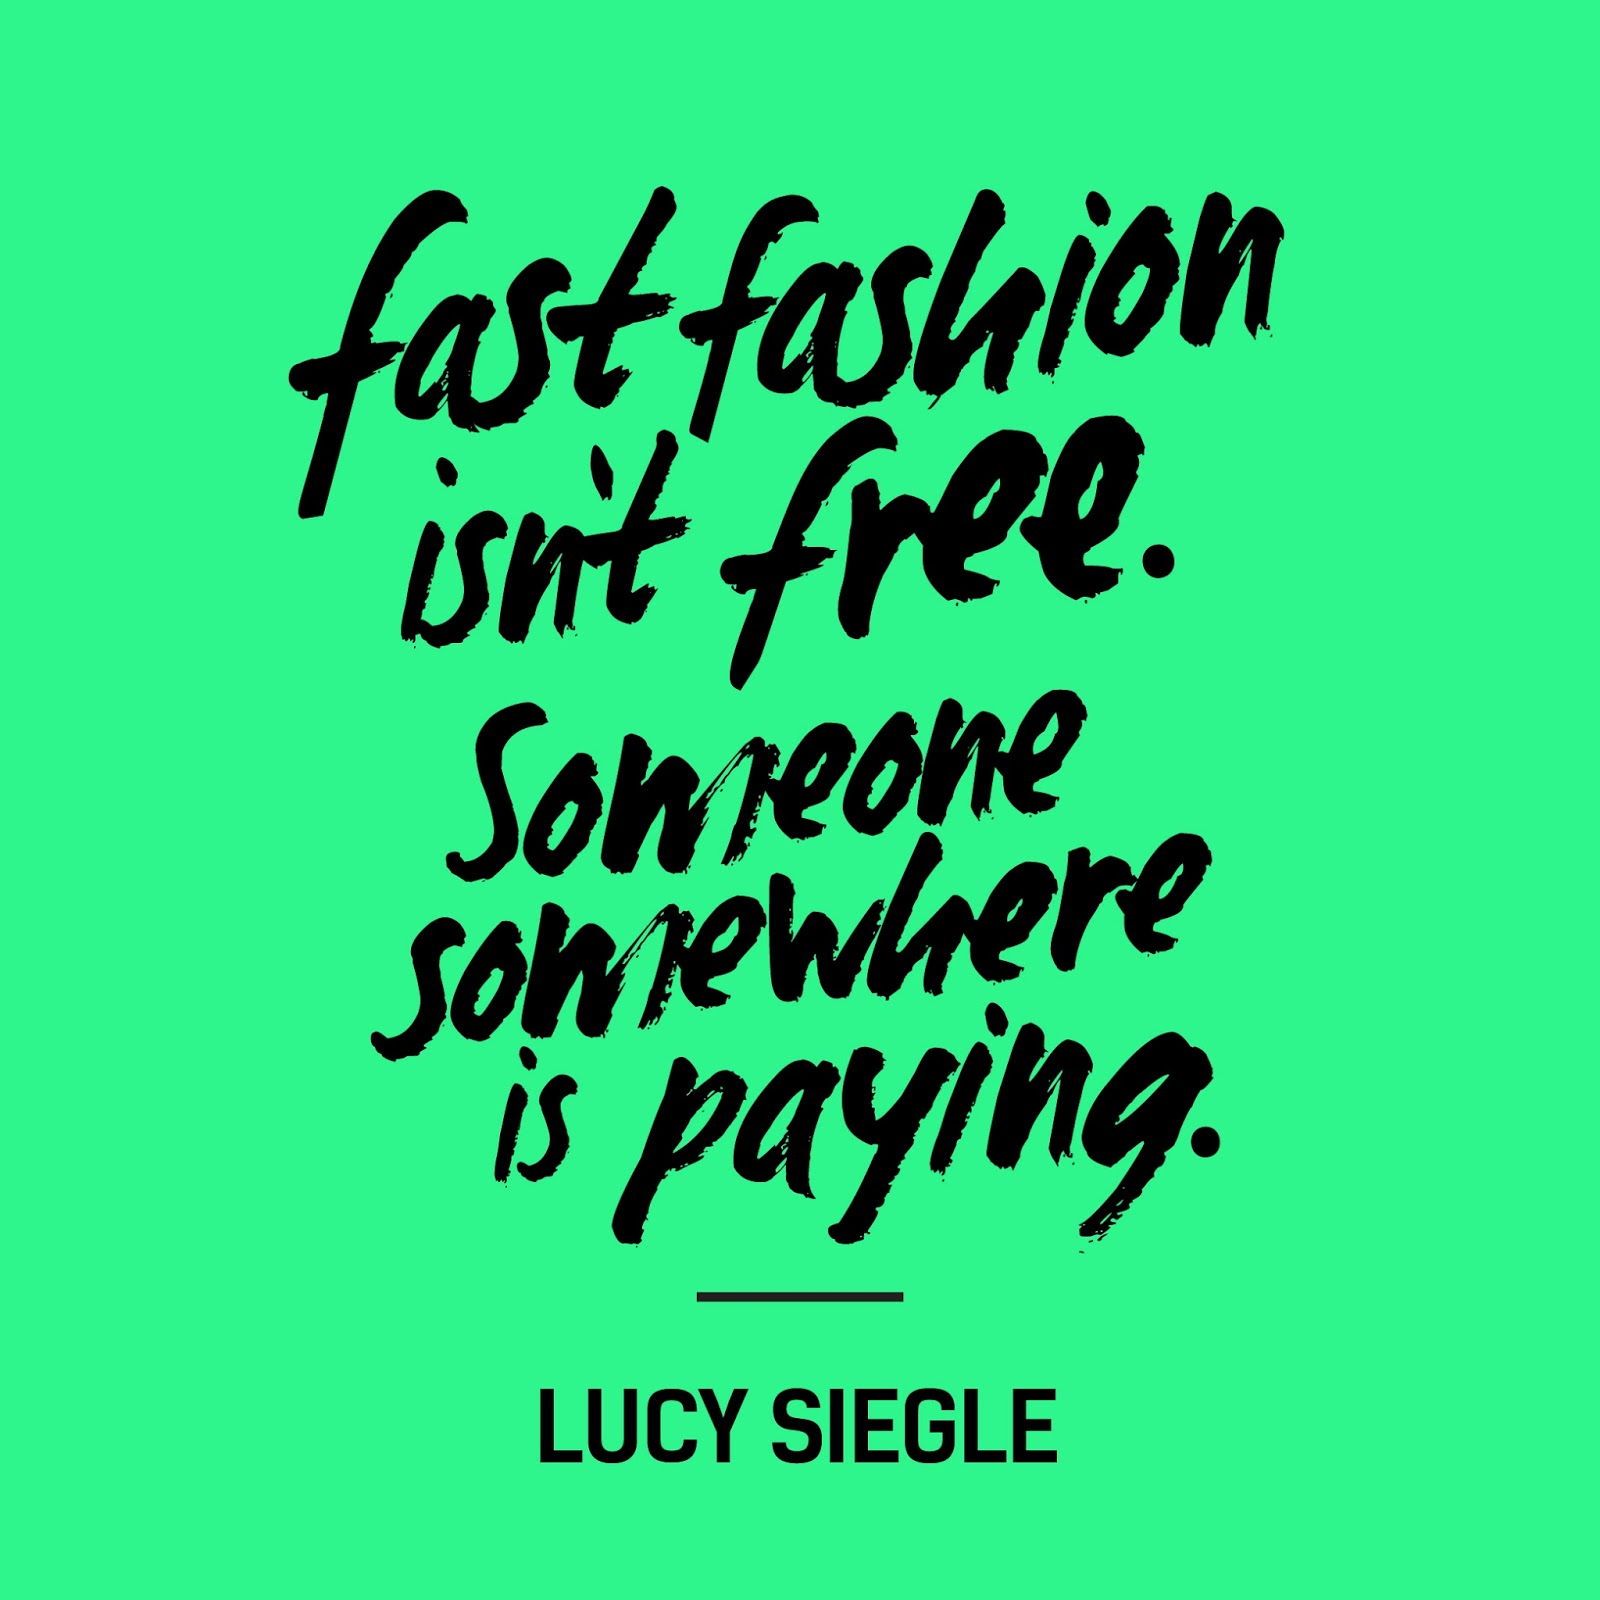 Bilderesultat for fast fashion